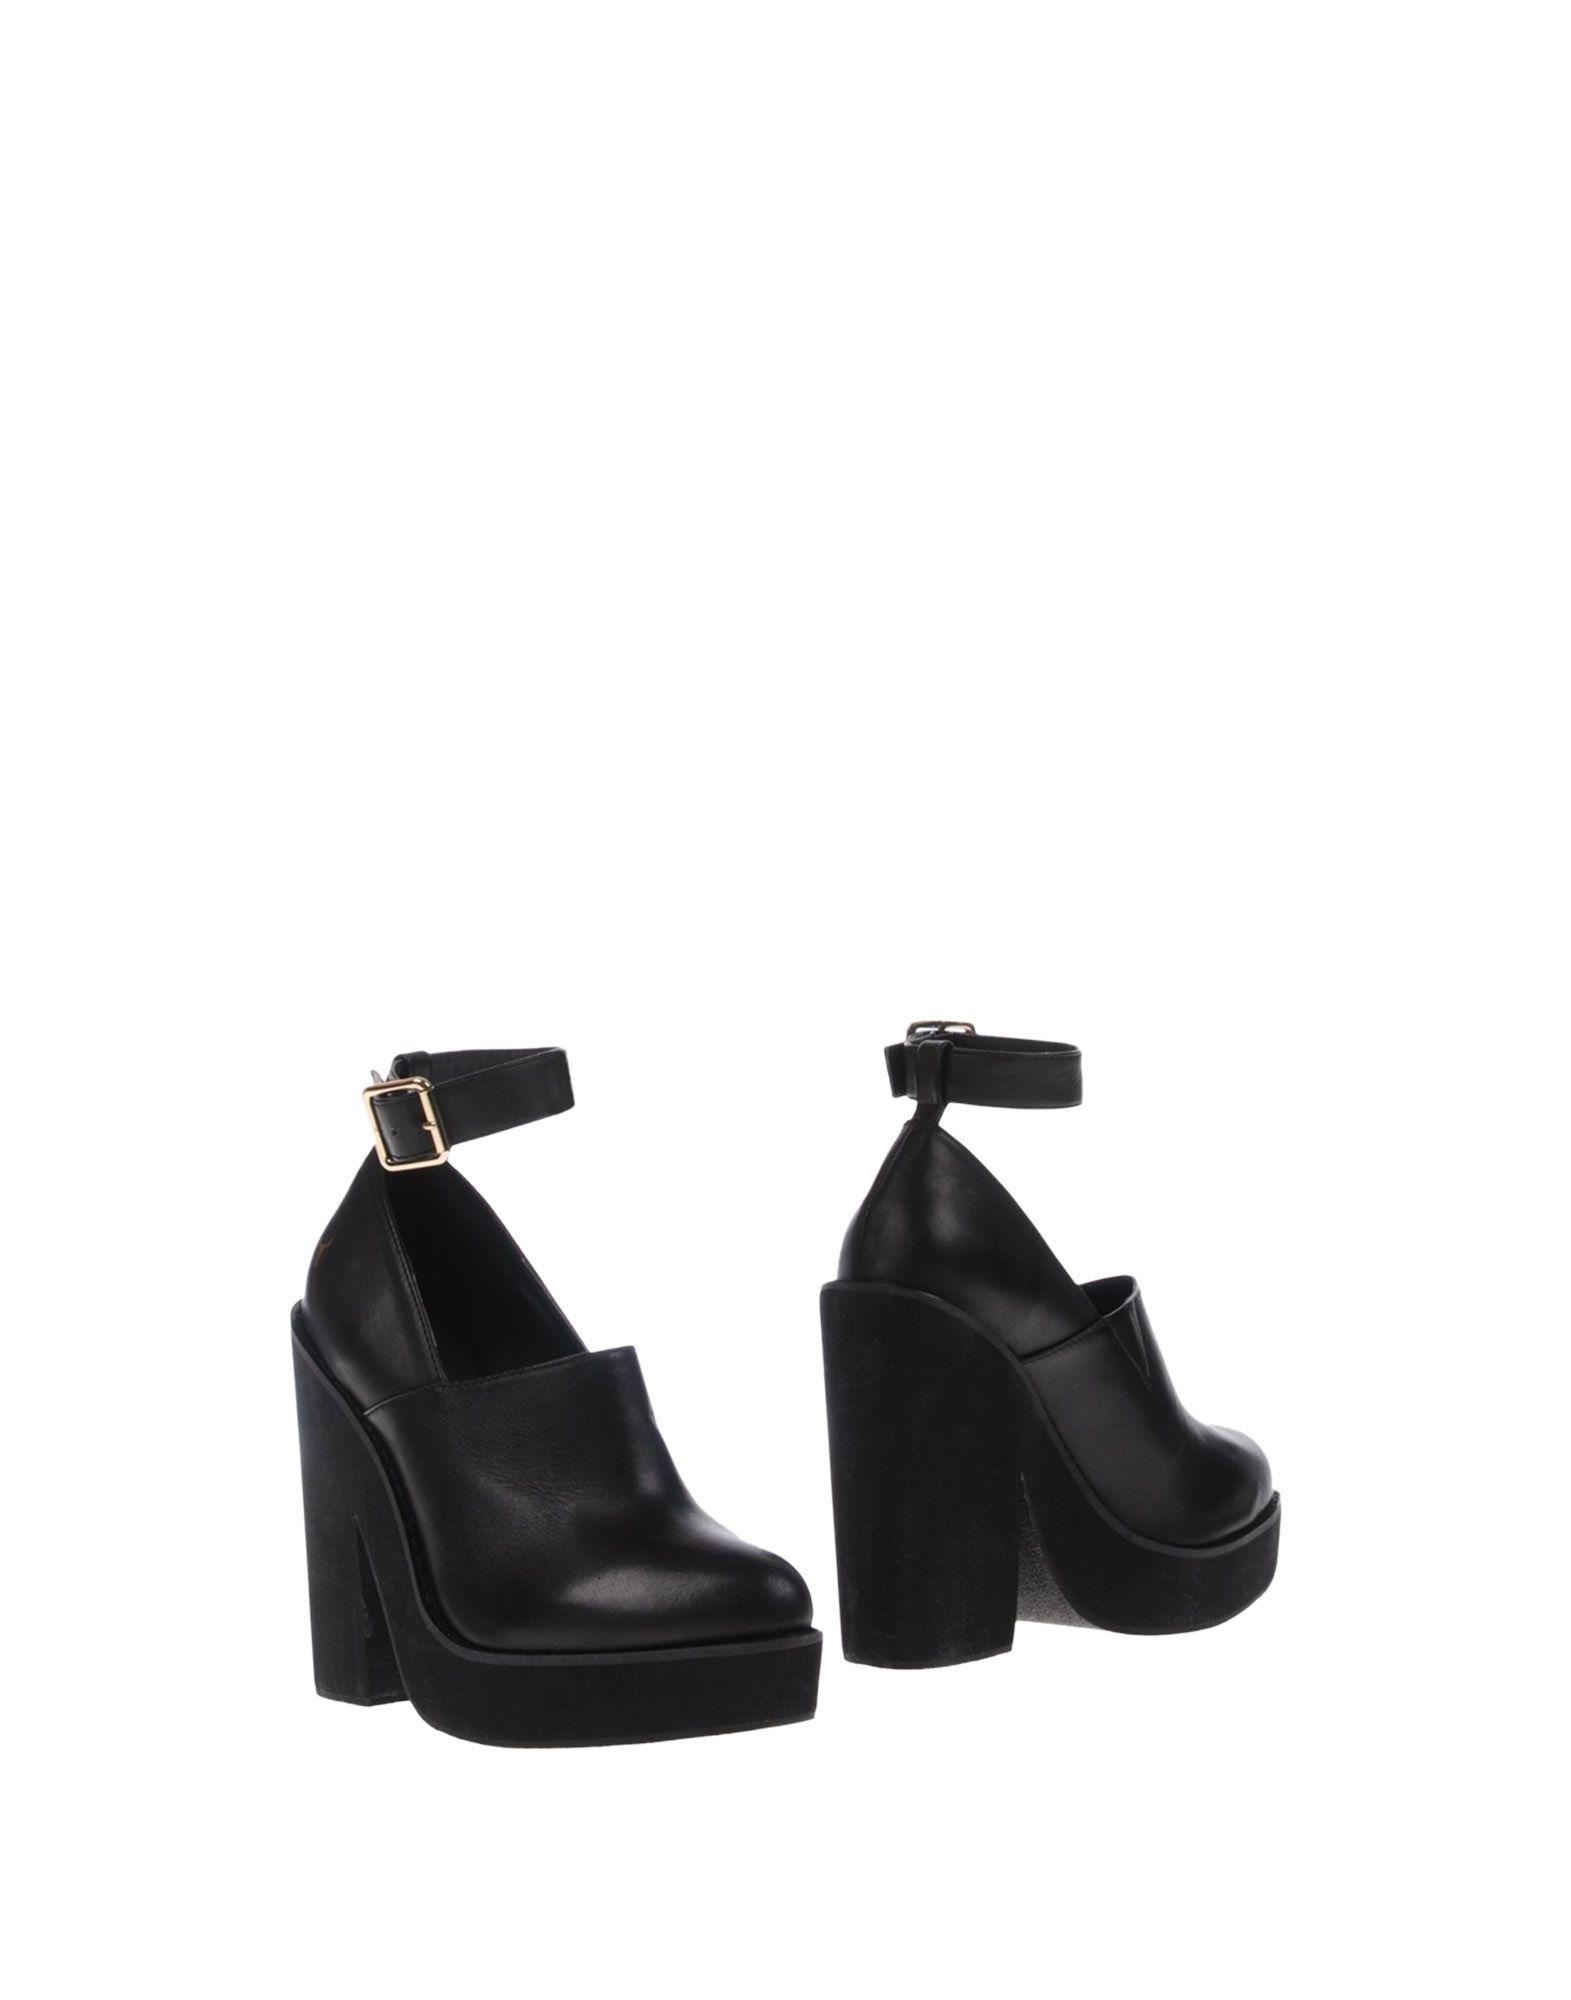 Windsor Smith Stiefelette Damen  Schuhe 11229672ER Gute Qualität beliebte Schuhe  85324a